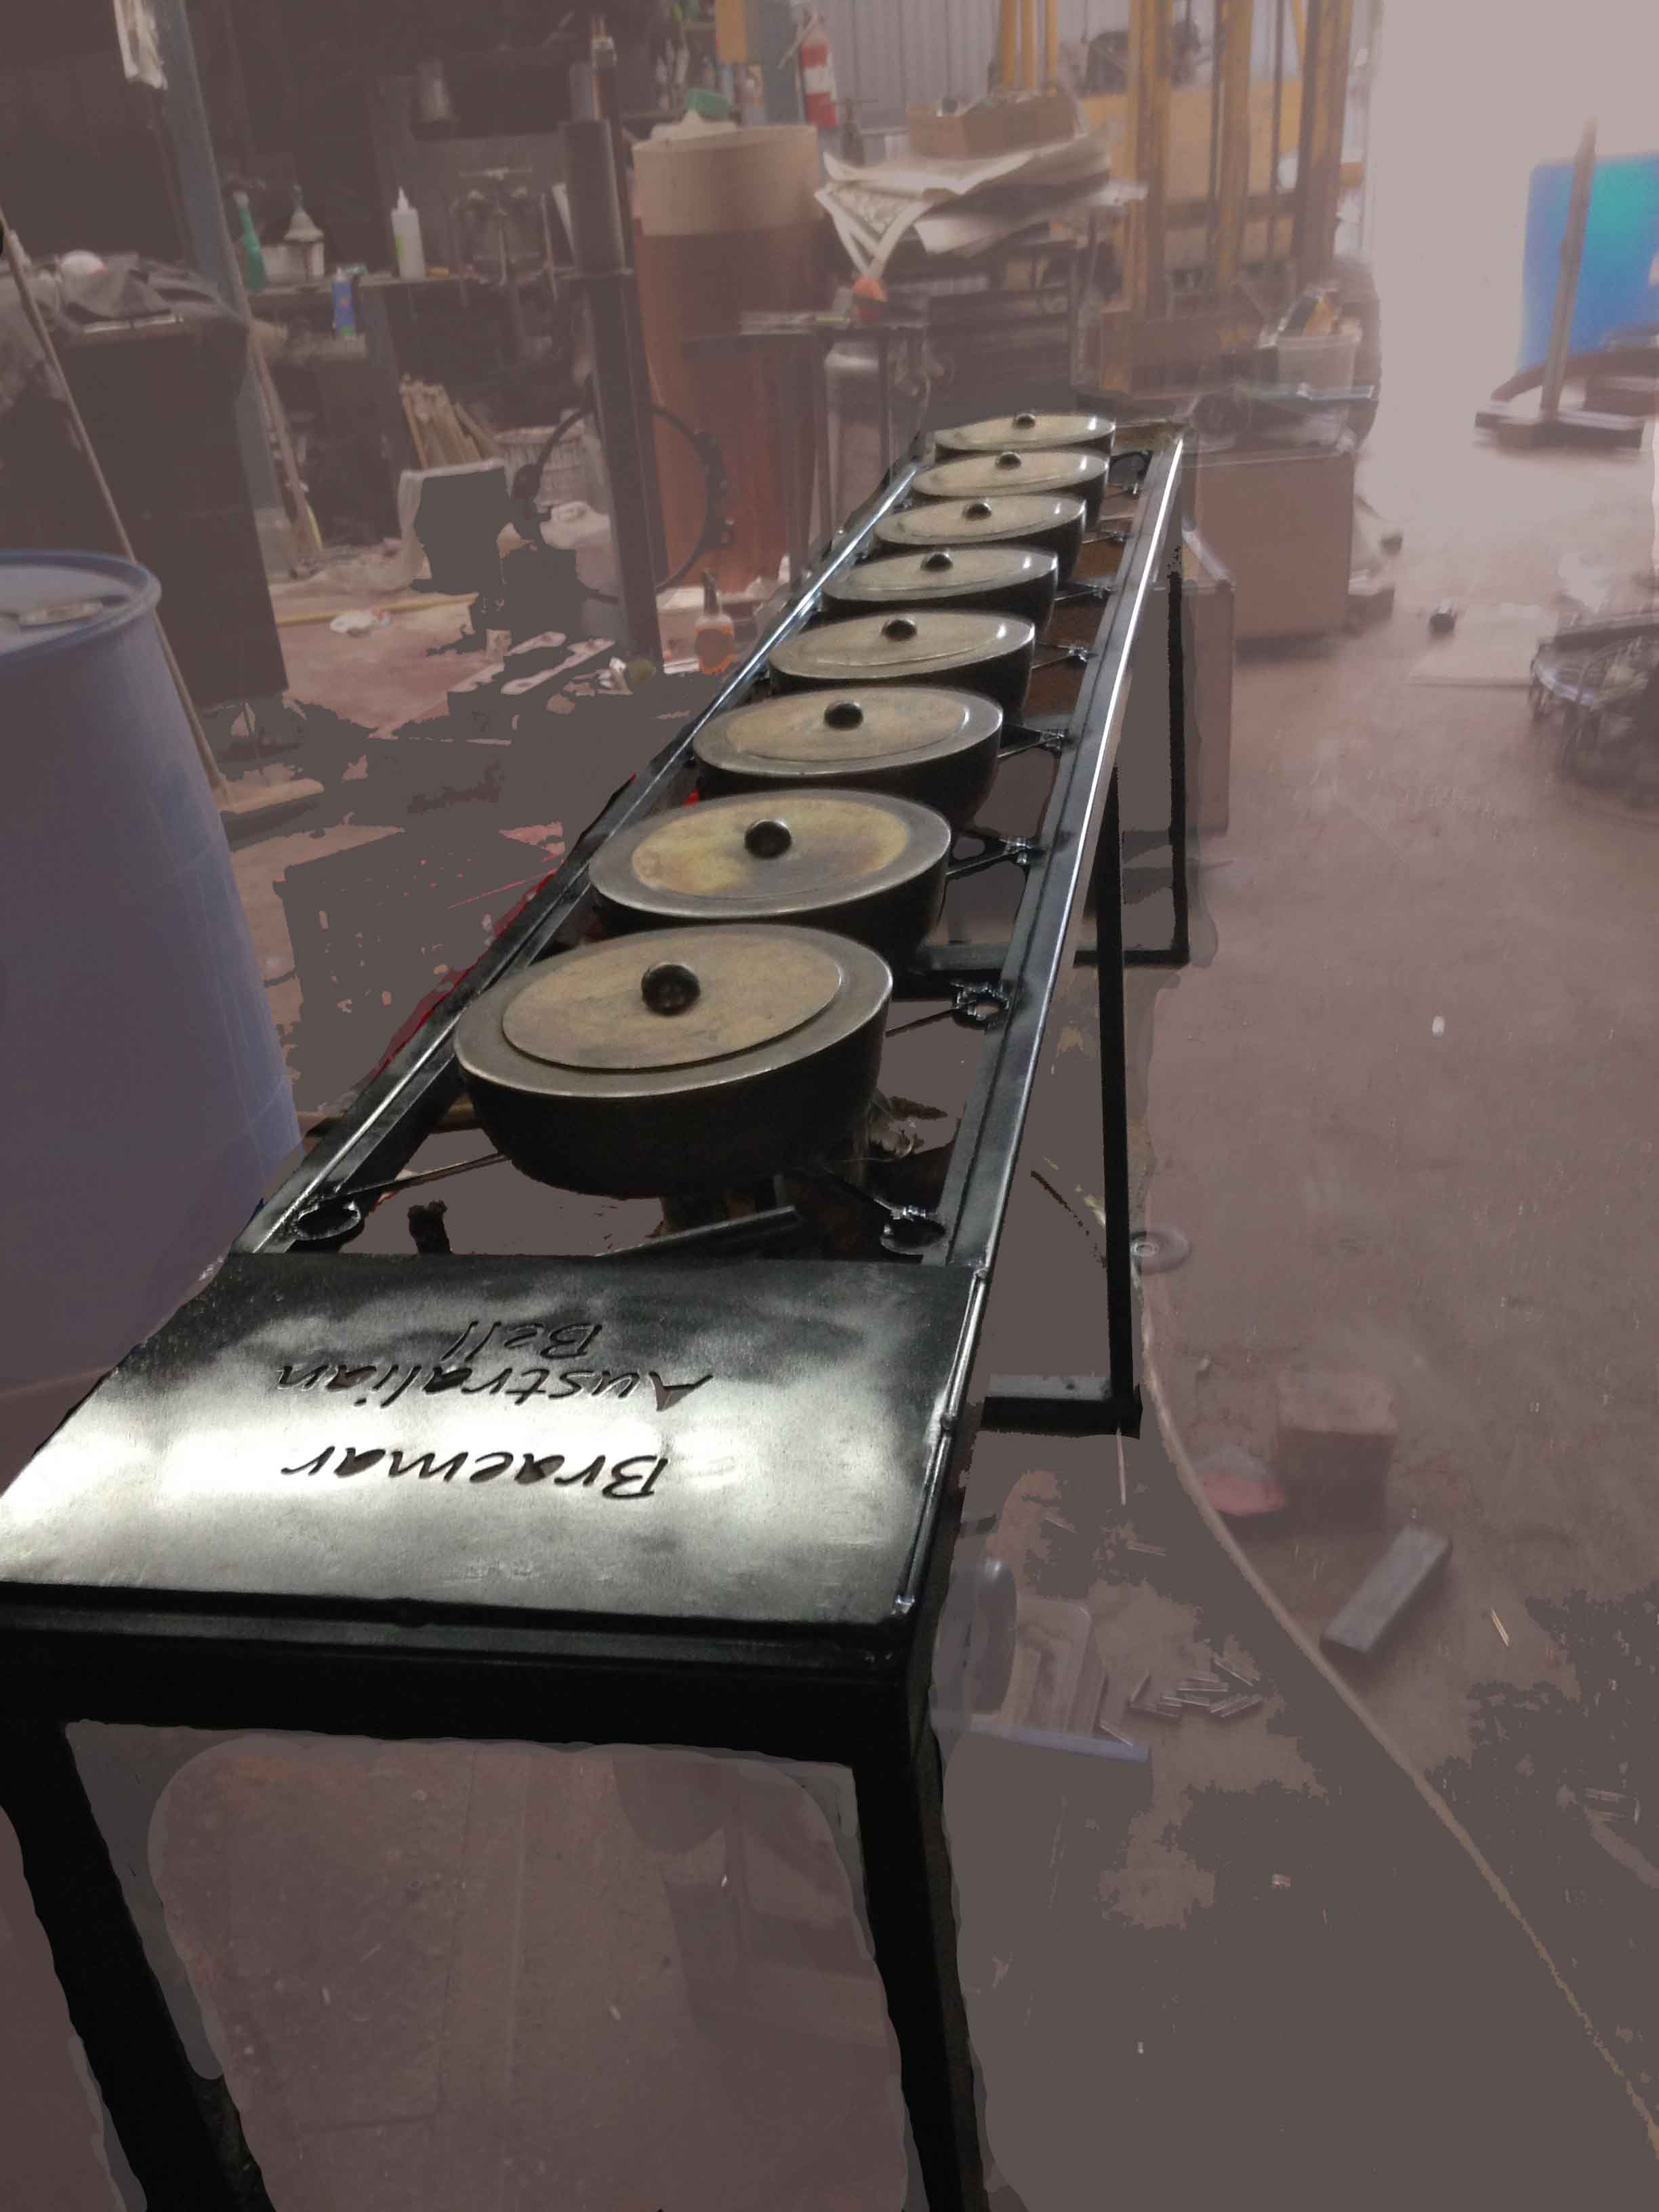 Hasell 'set of bronze gongs' Braemar College 2016